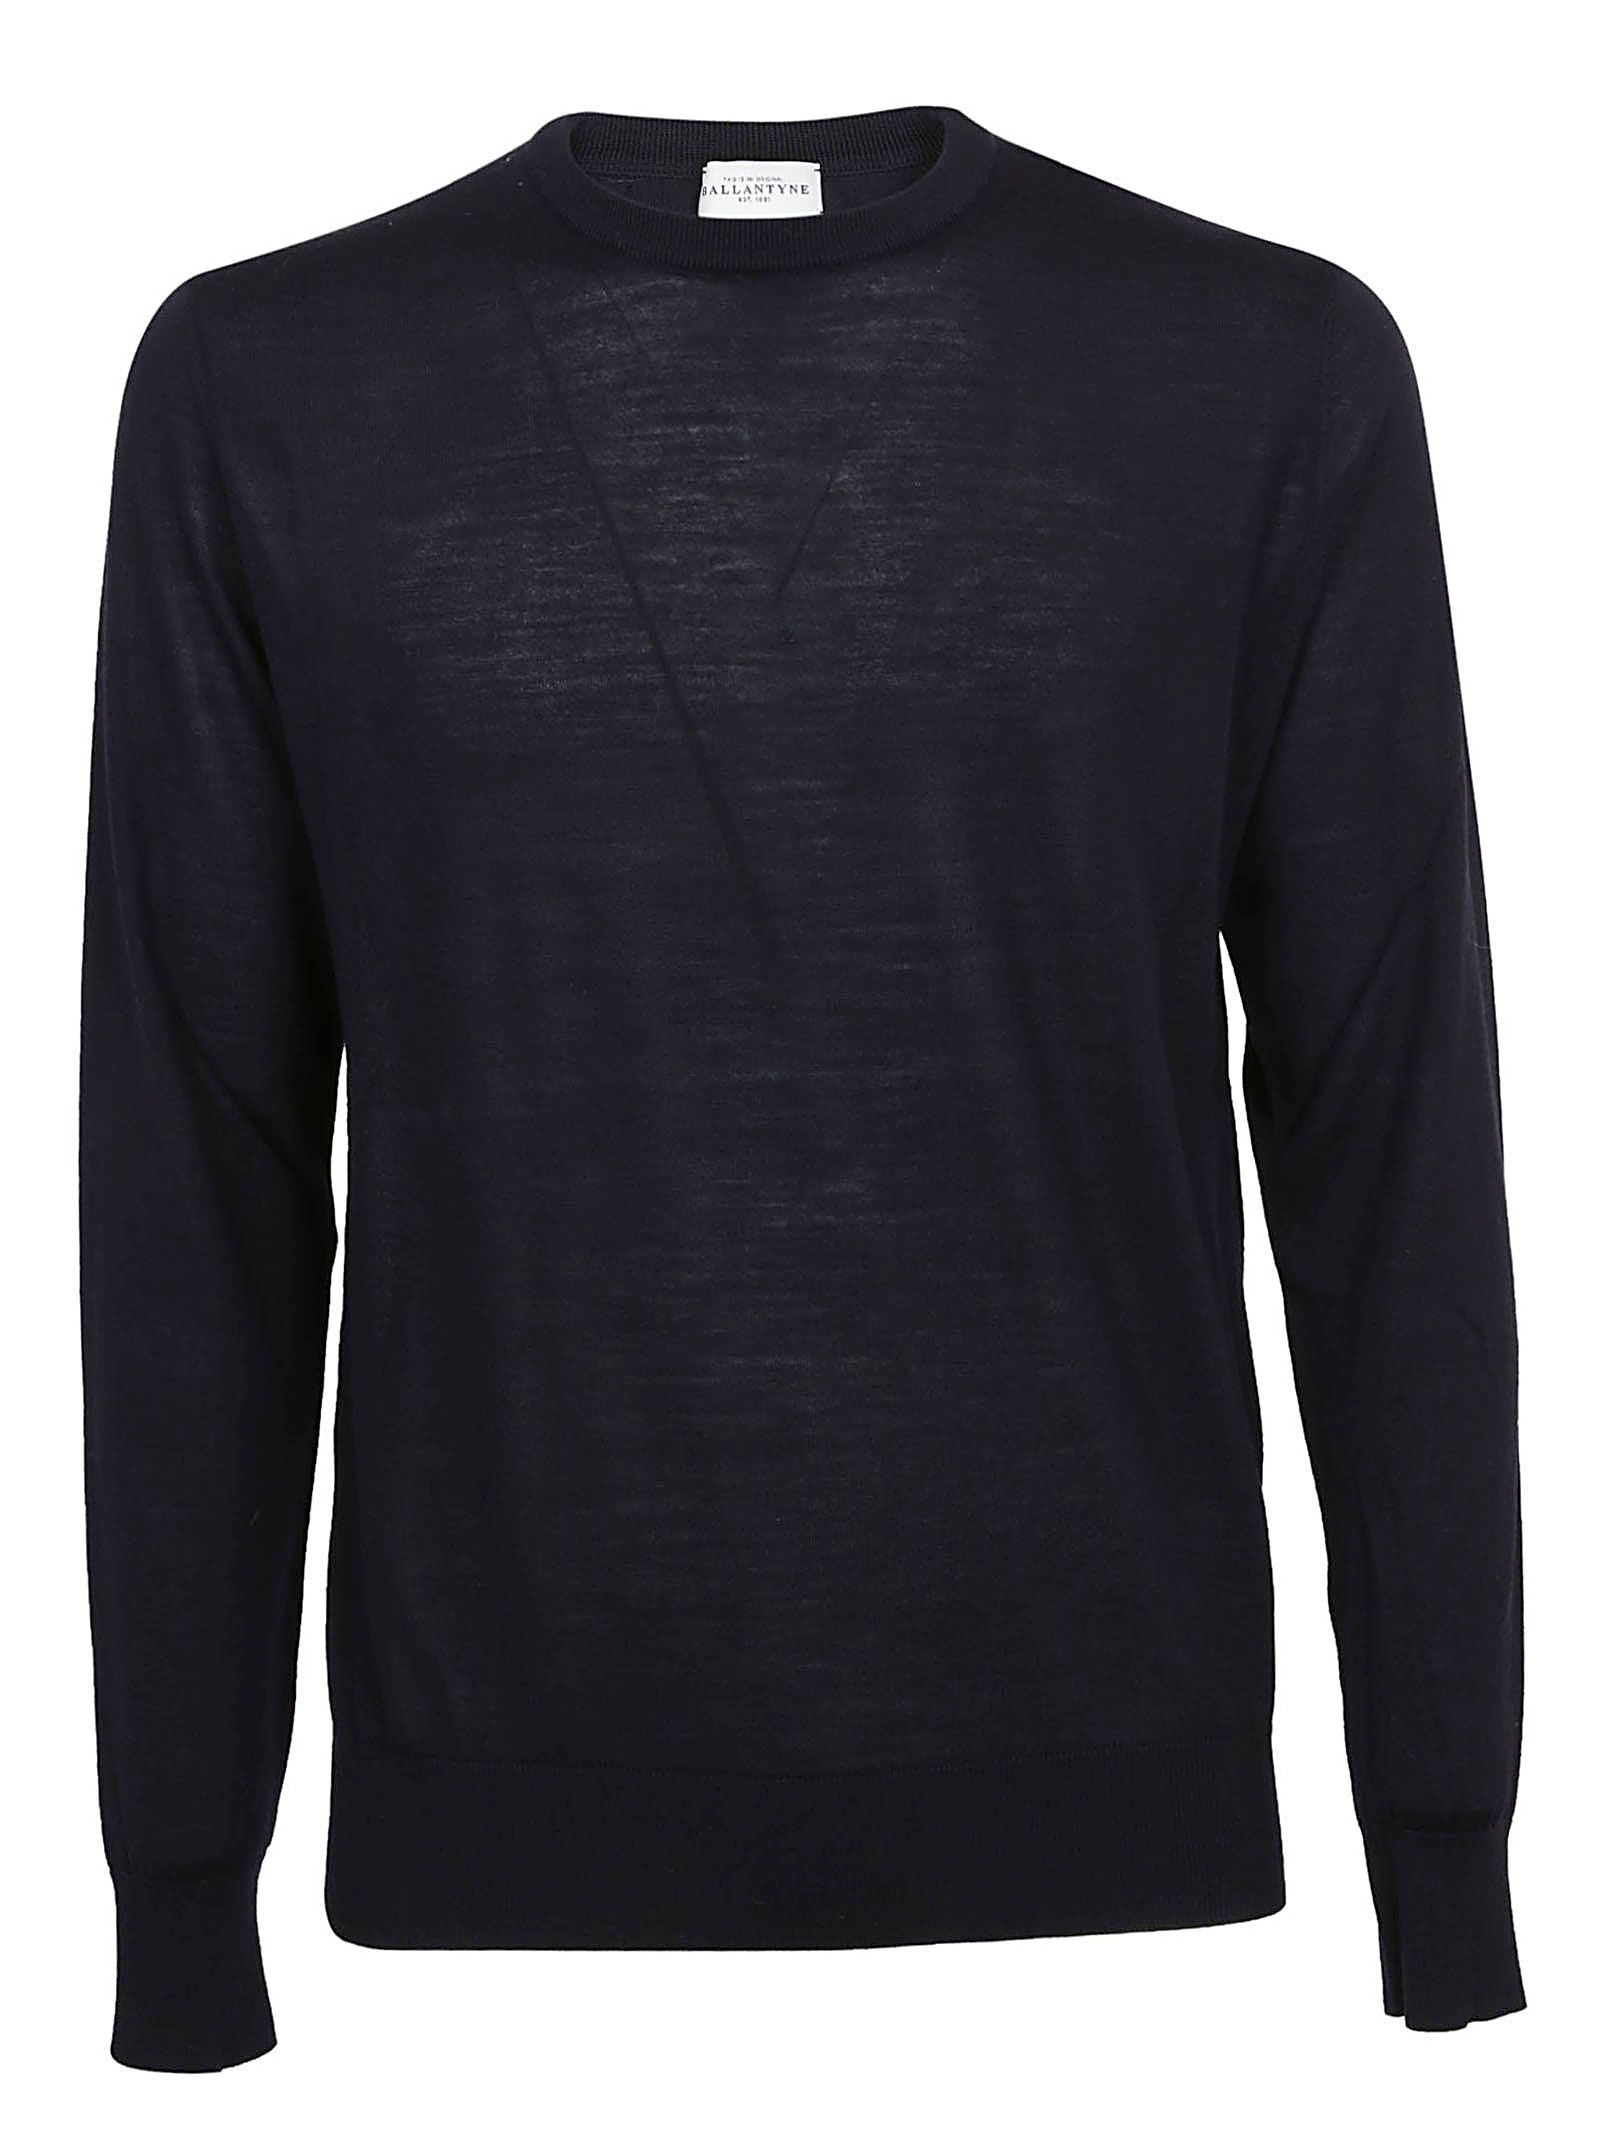 25bb2dd17 Ballantyne Ballantyne Crew Neck Sweater - Nero - 10681546